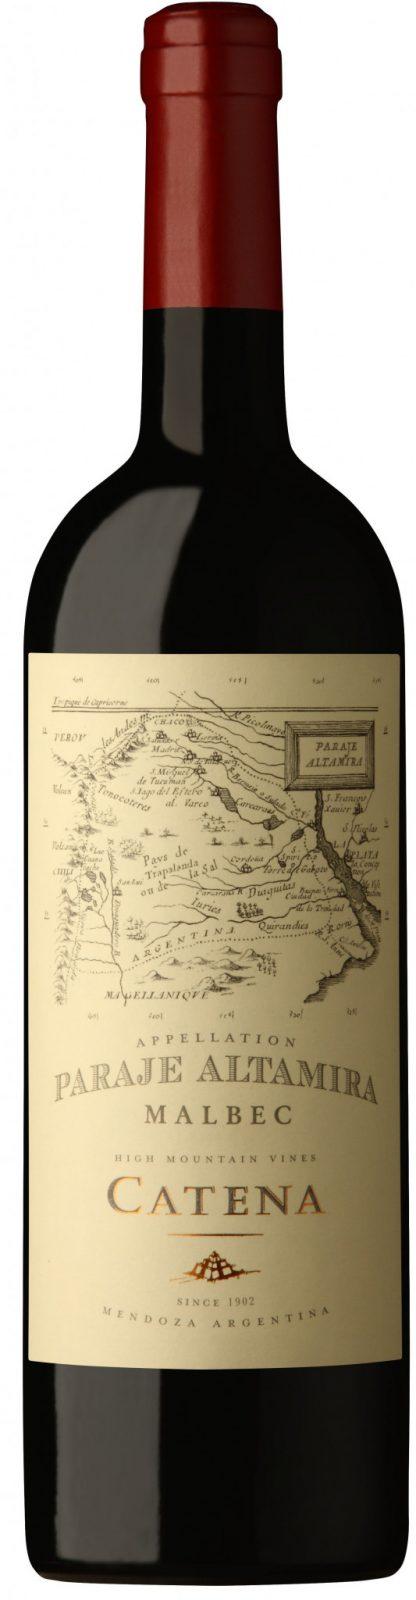 CATENA APP PARAJE ALTAMIRA MALBEC_wineaffair